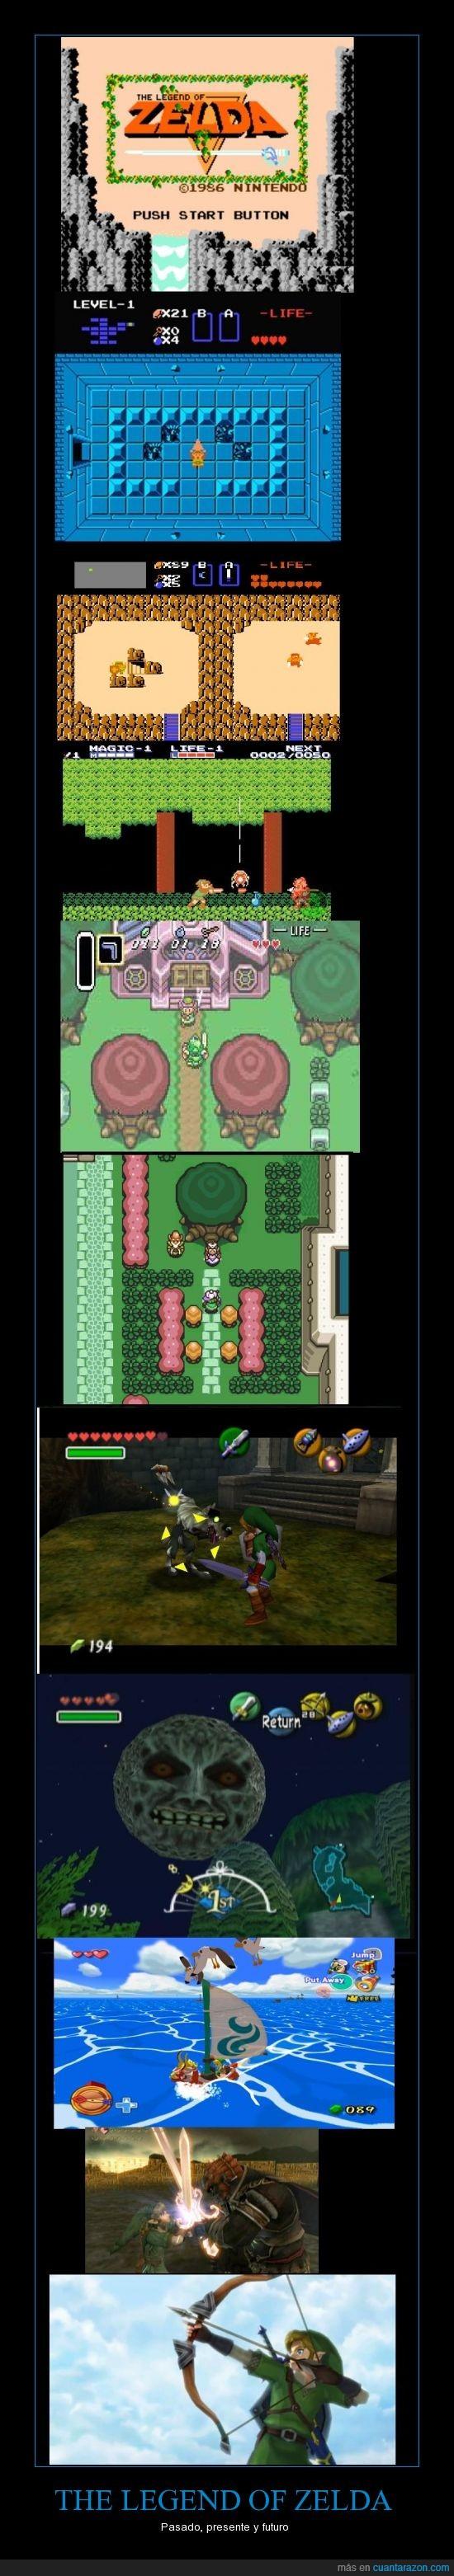 3ds,futuro me refiero al WiiU,game cube,hyrule,link,n64,nintendo,zelda